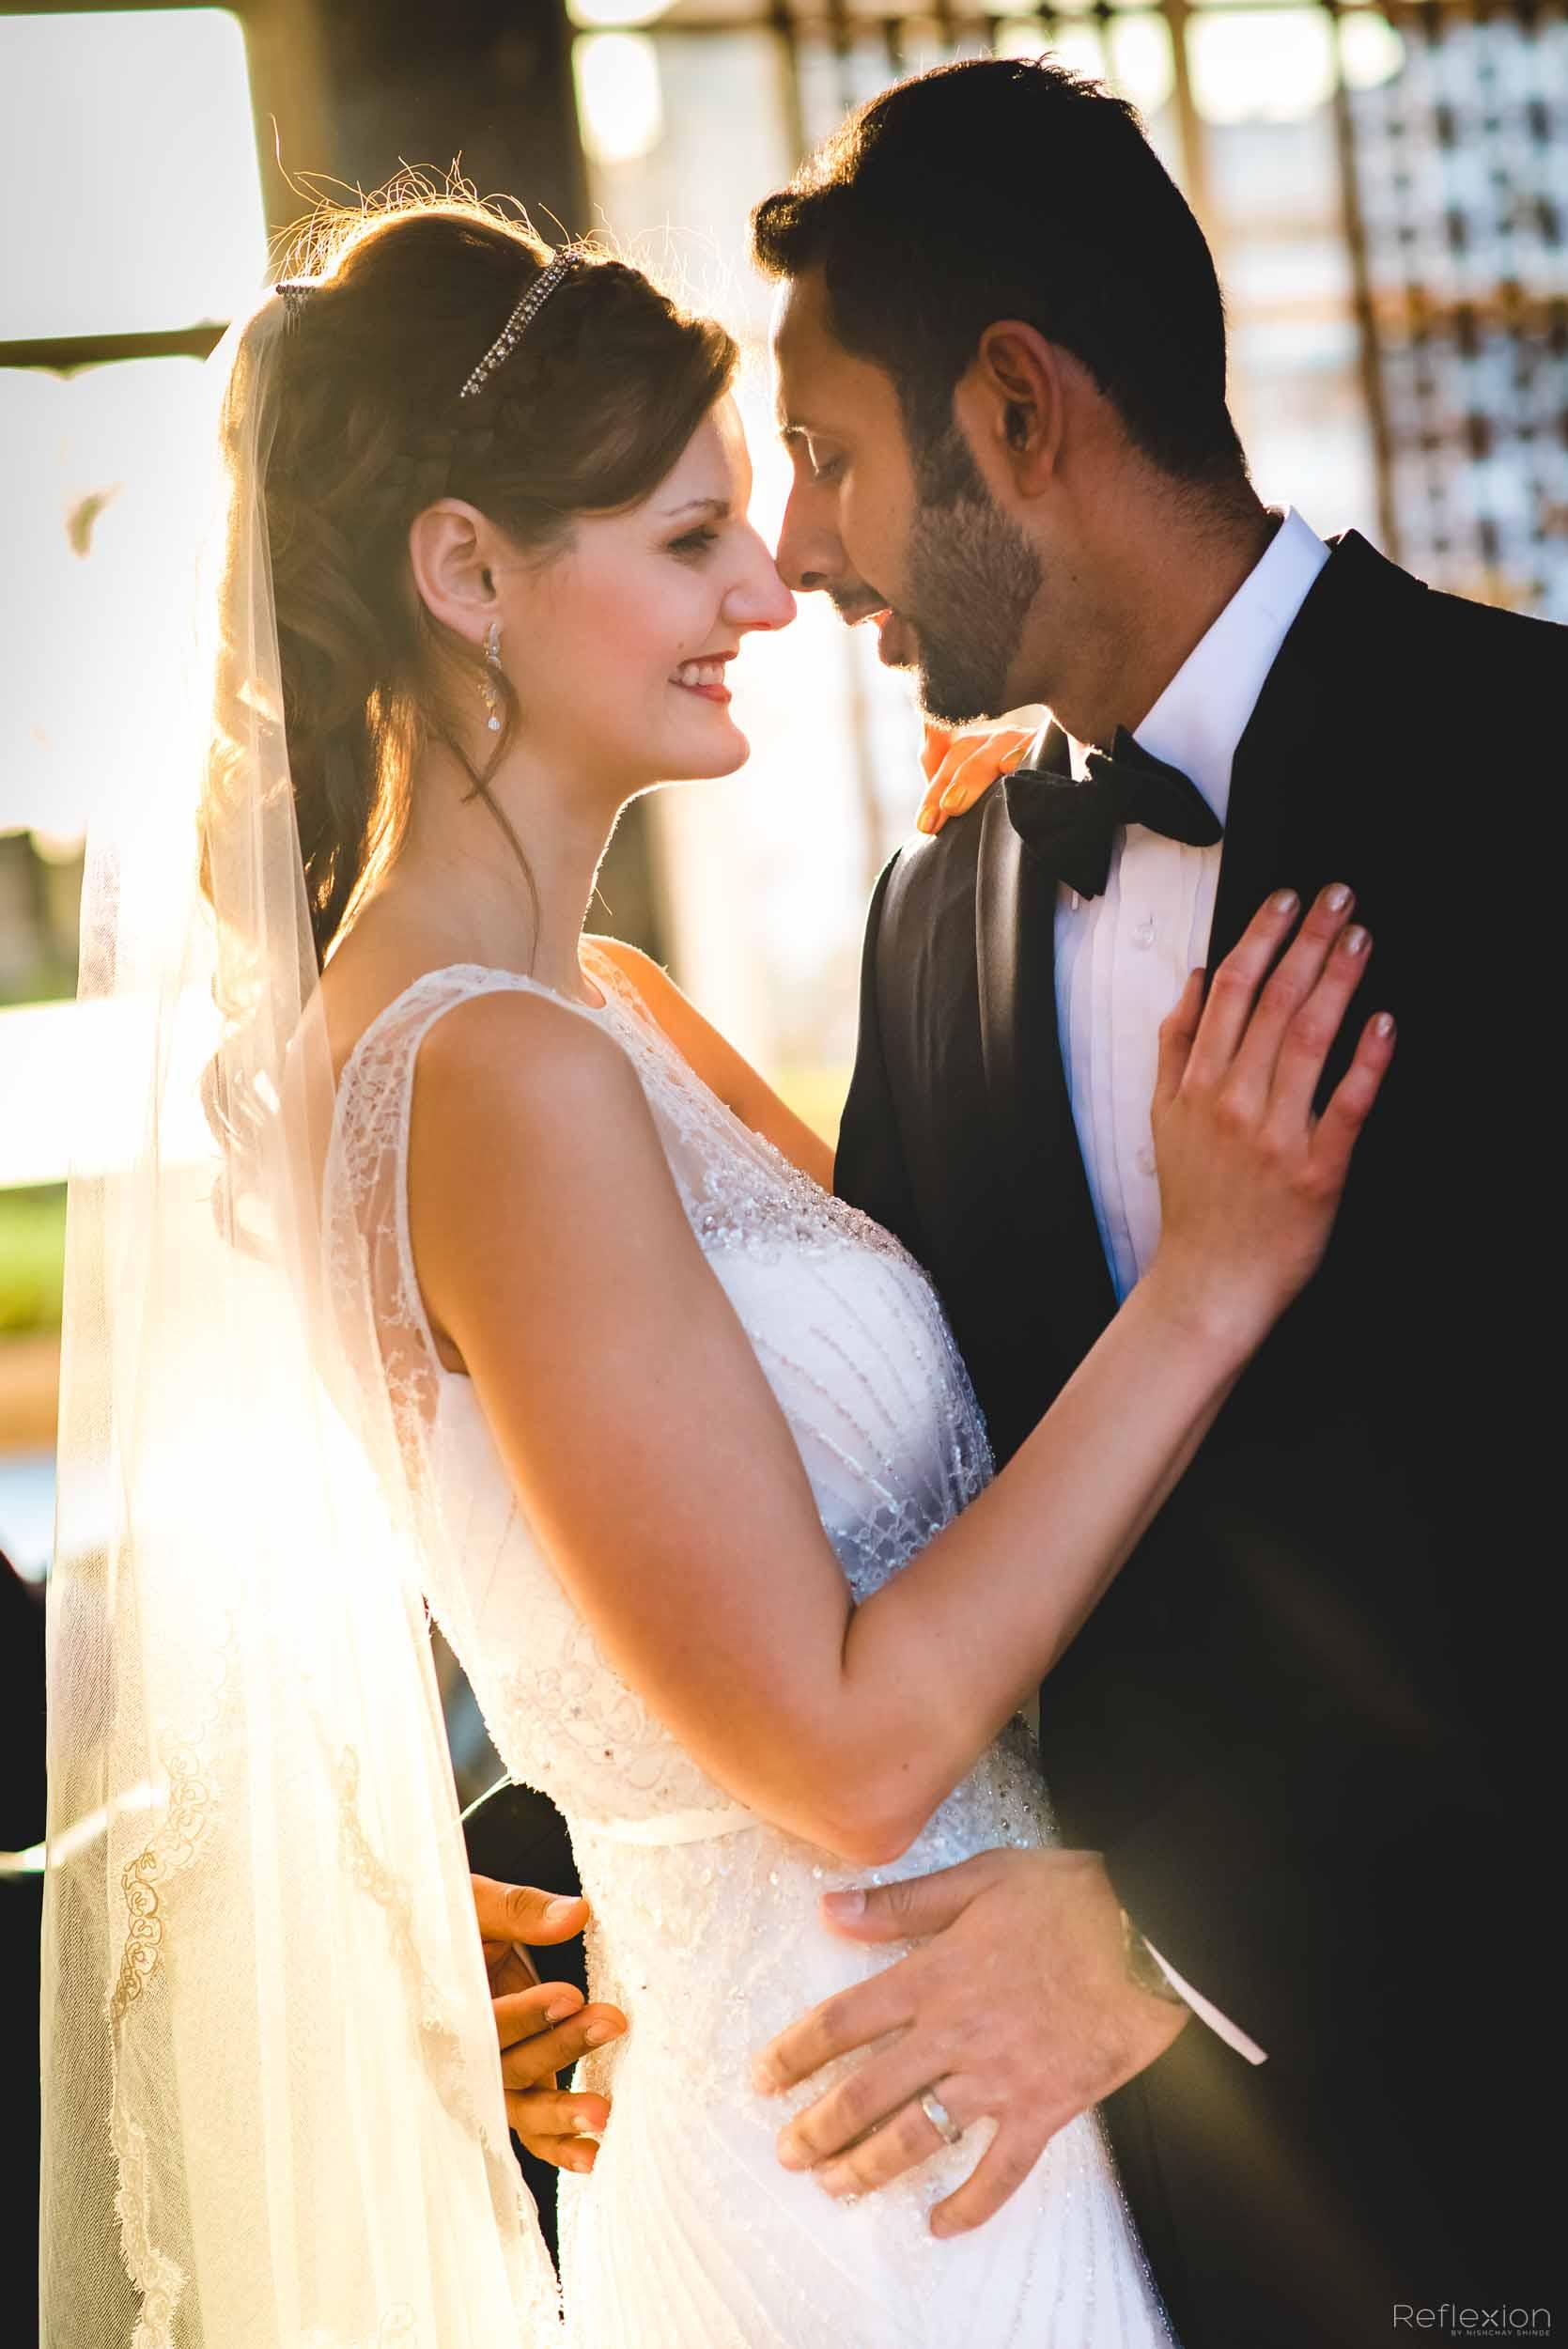 american-indian-wedding-53.jpg